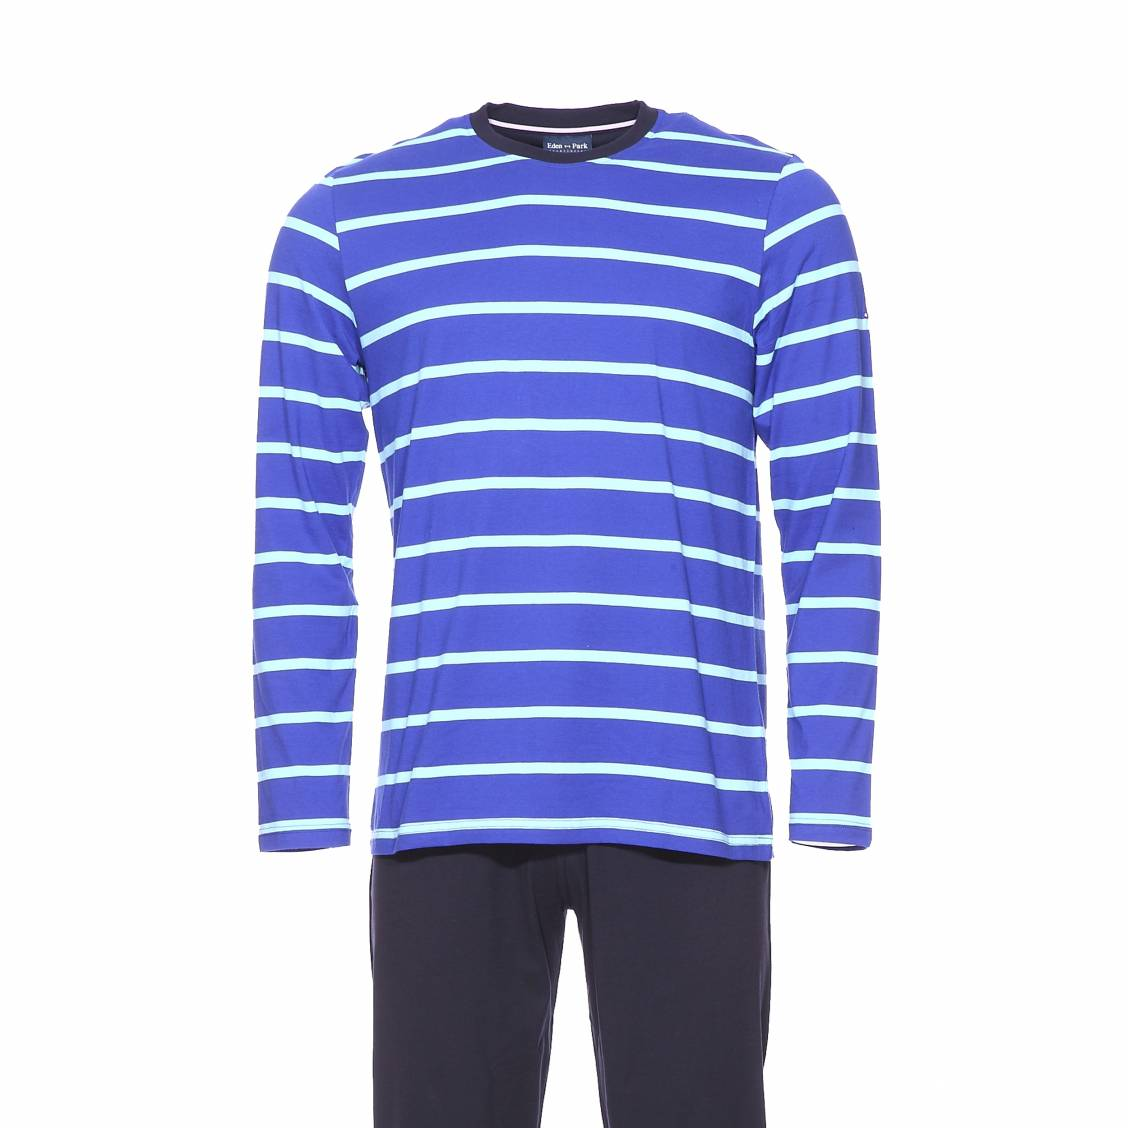 Pyjama long  en coton : tee-shirt manches longues bleu indigo rayé turquoise et pantalon uni noir